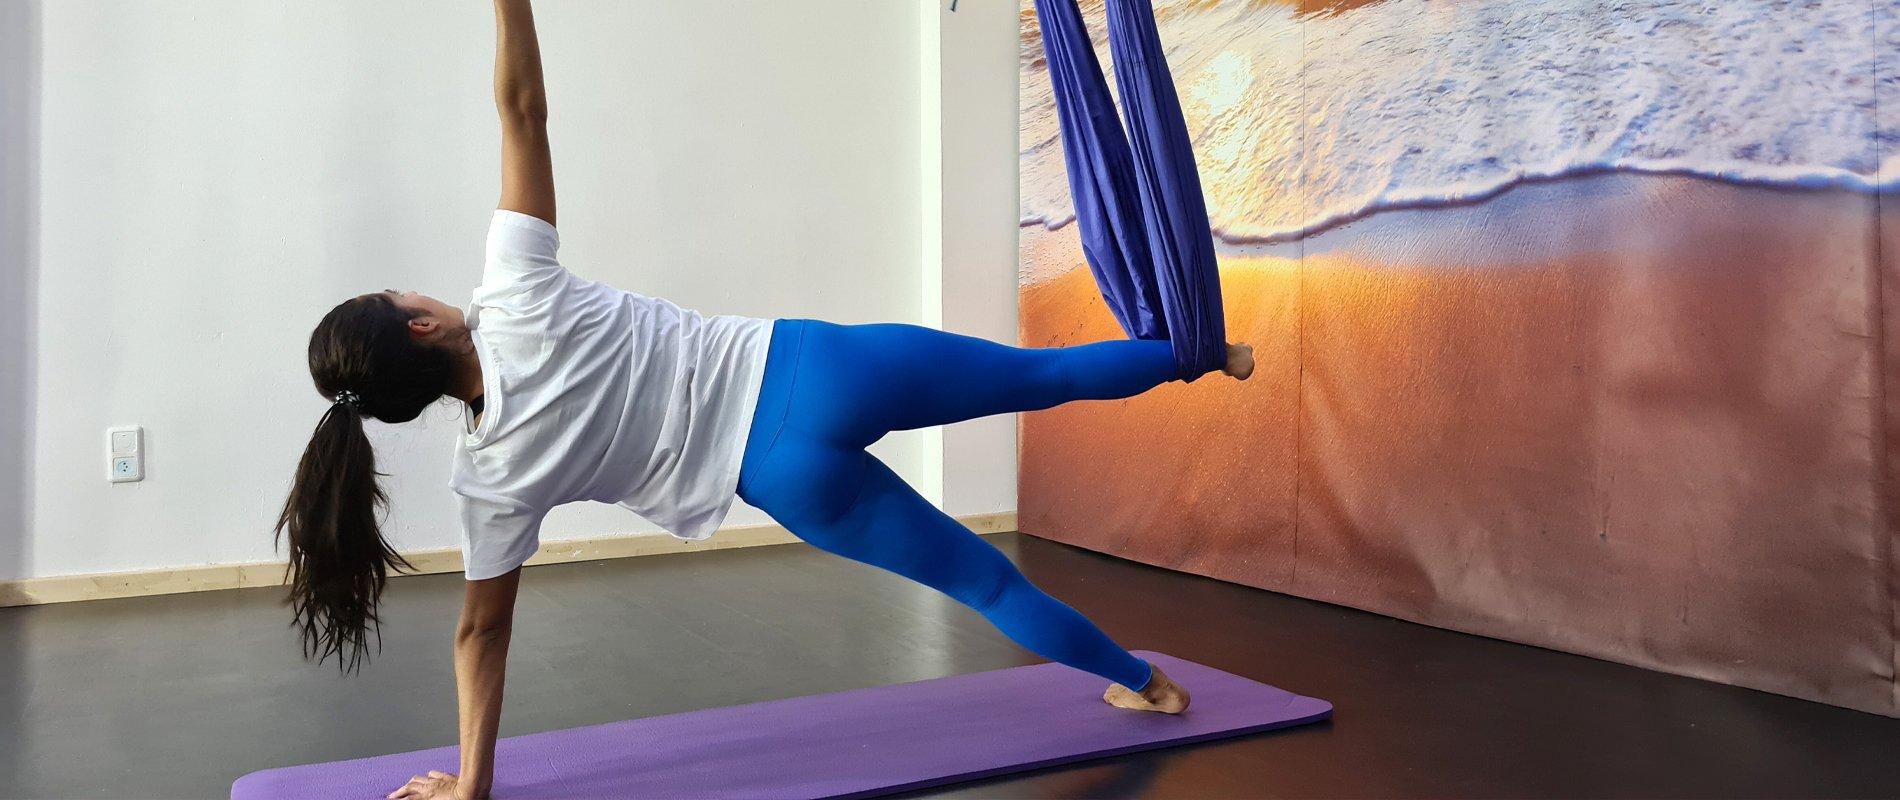 Centro Daniela Goitre - Pilates Aéreo Zaragoza